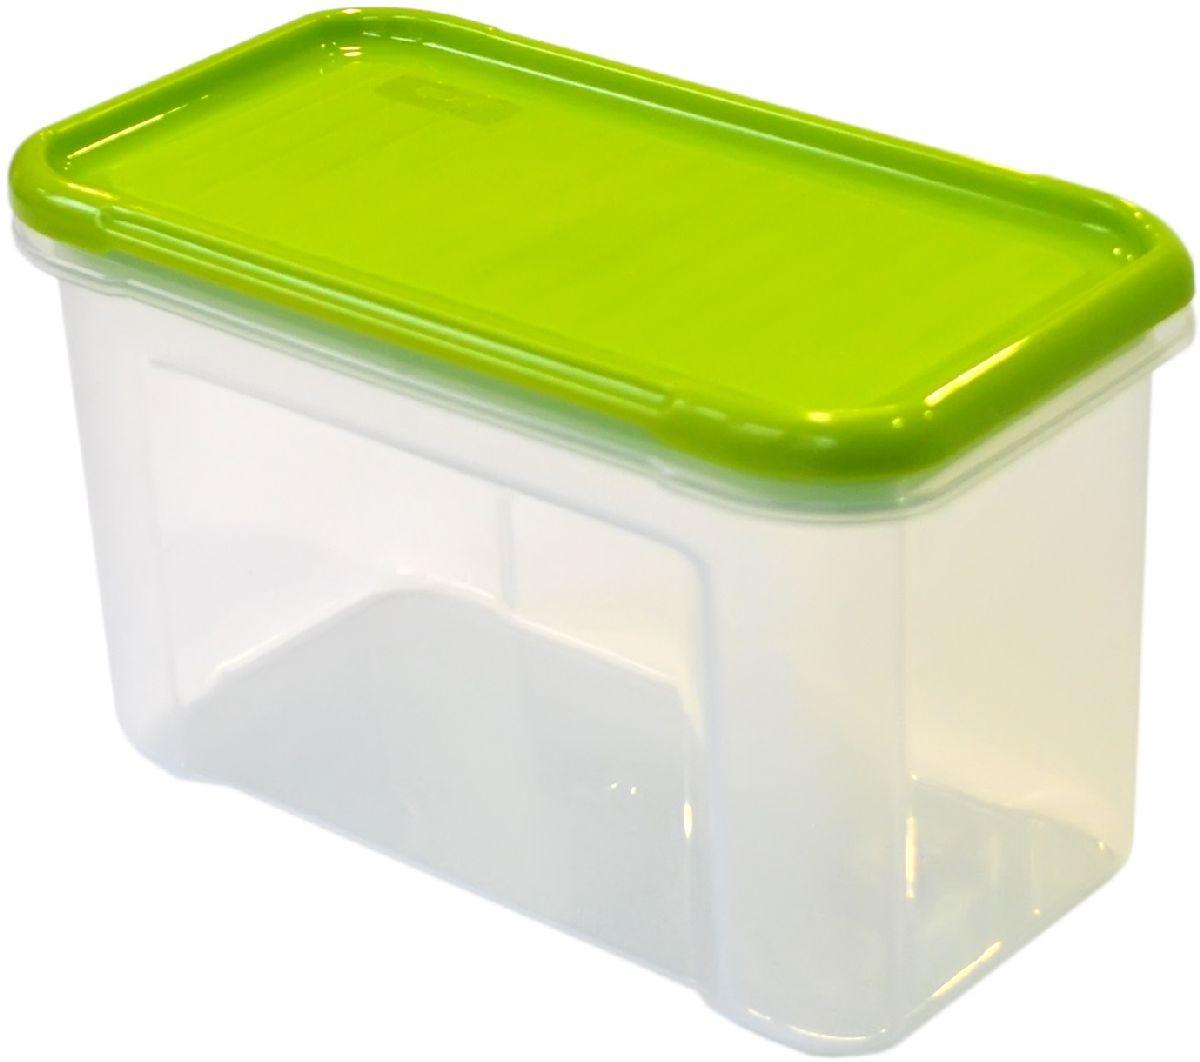 Фото - Банка для сыпучих продуктов Giaretti Krupa, цвет: оливковый, прозрачный, 750 мл банка для сыпучих продуктов giaretti с дозатором 800 мл